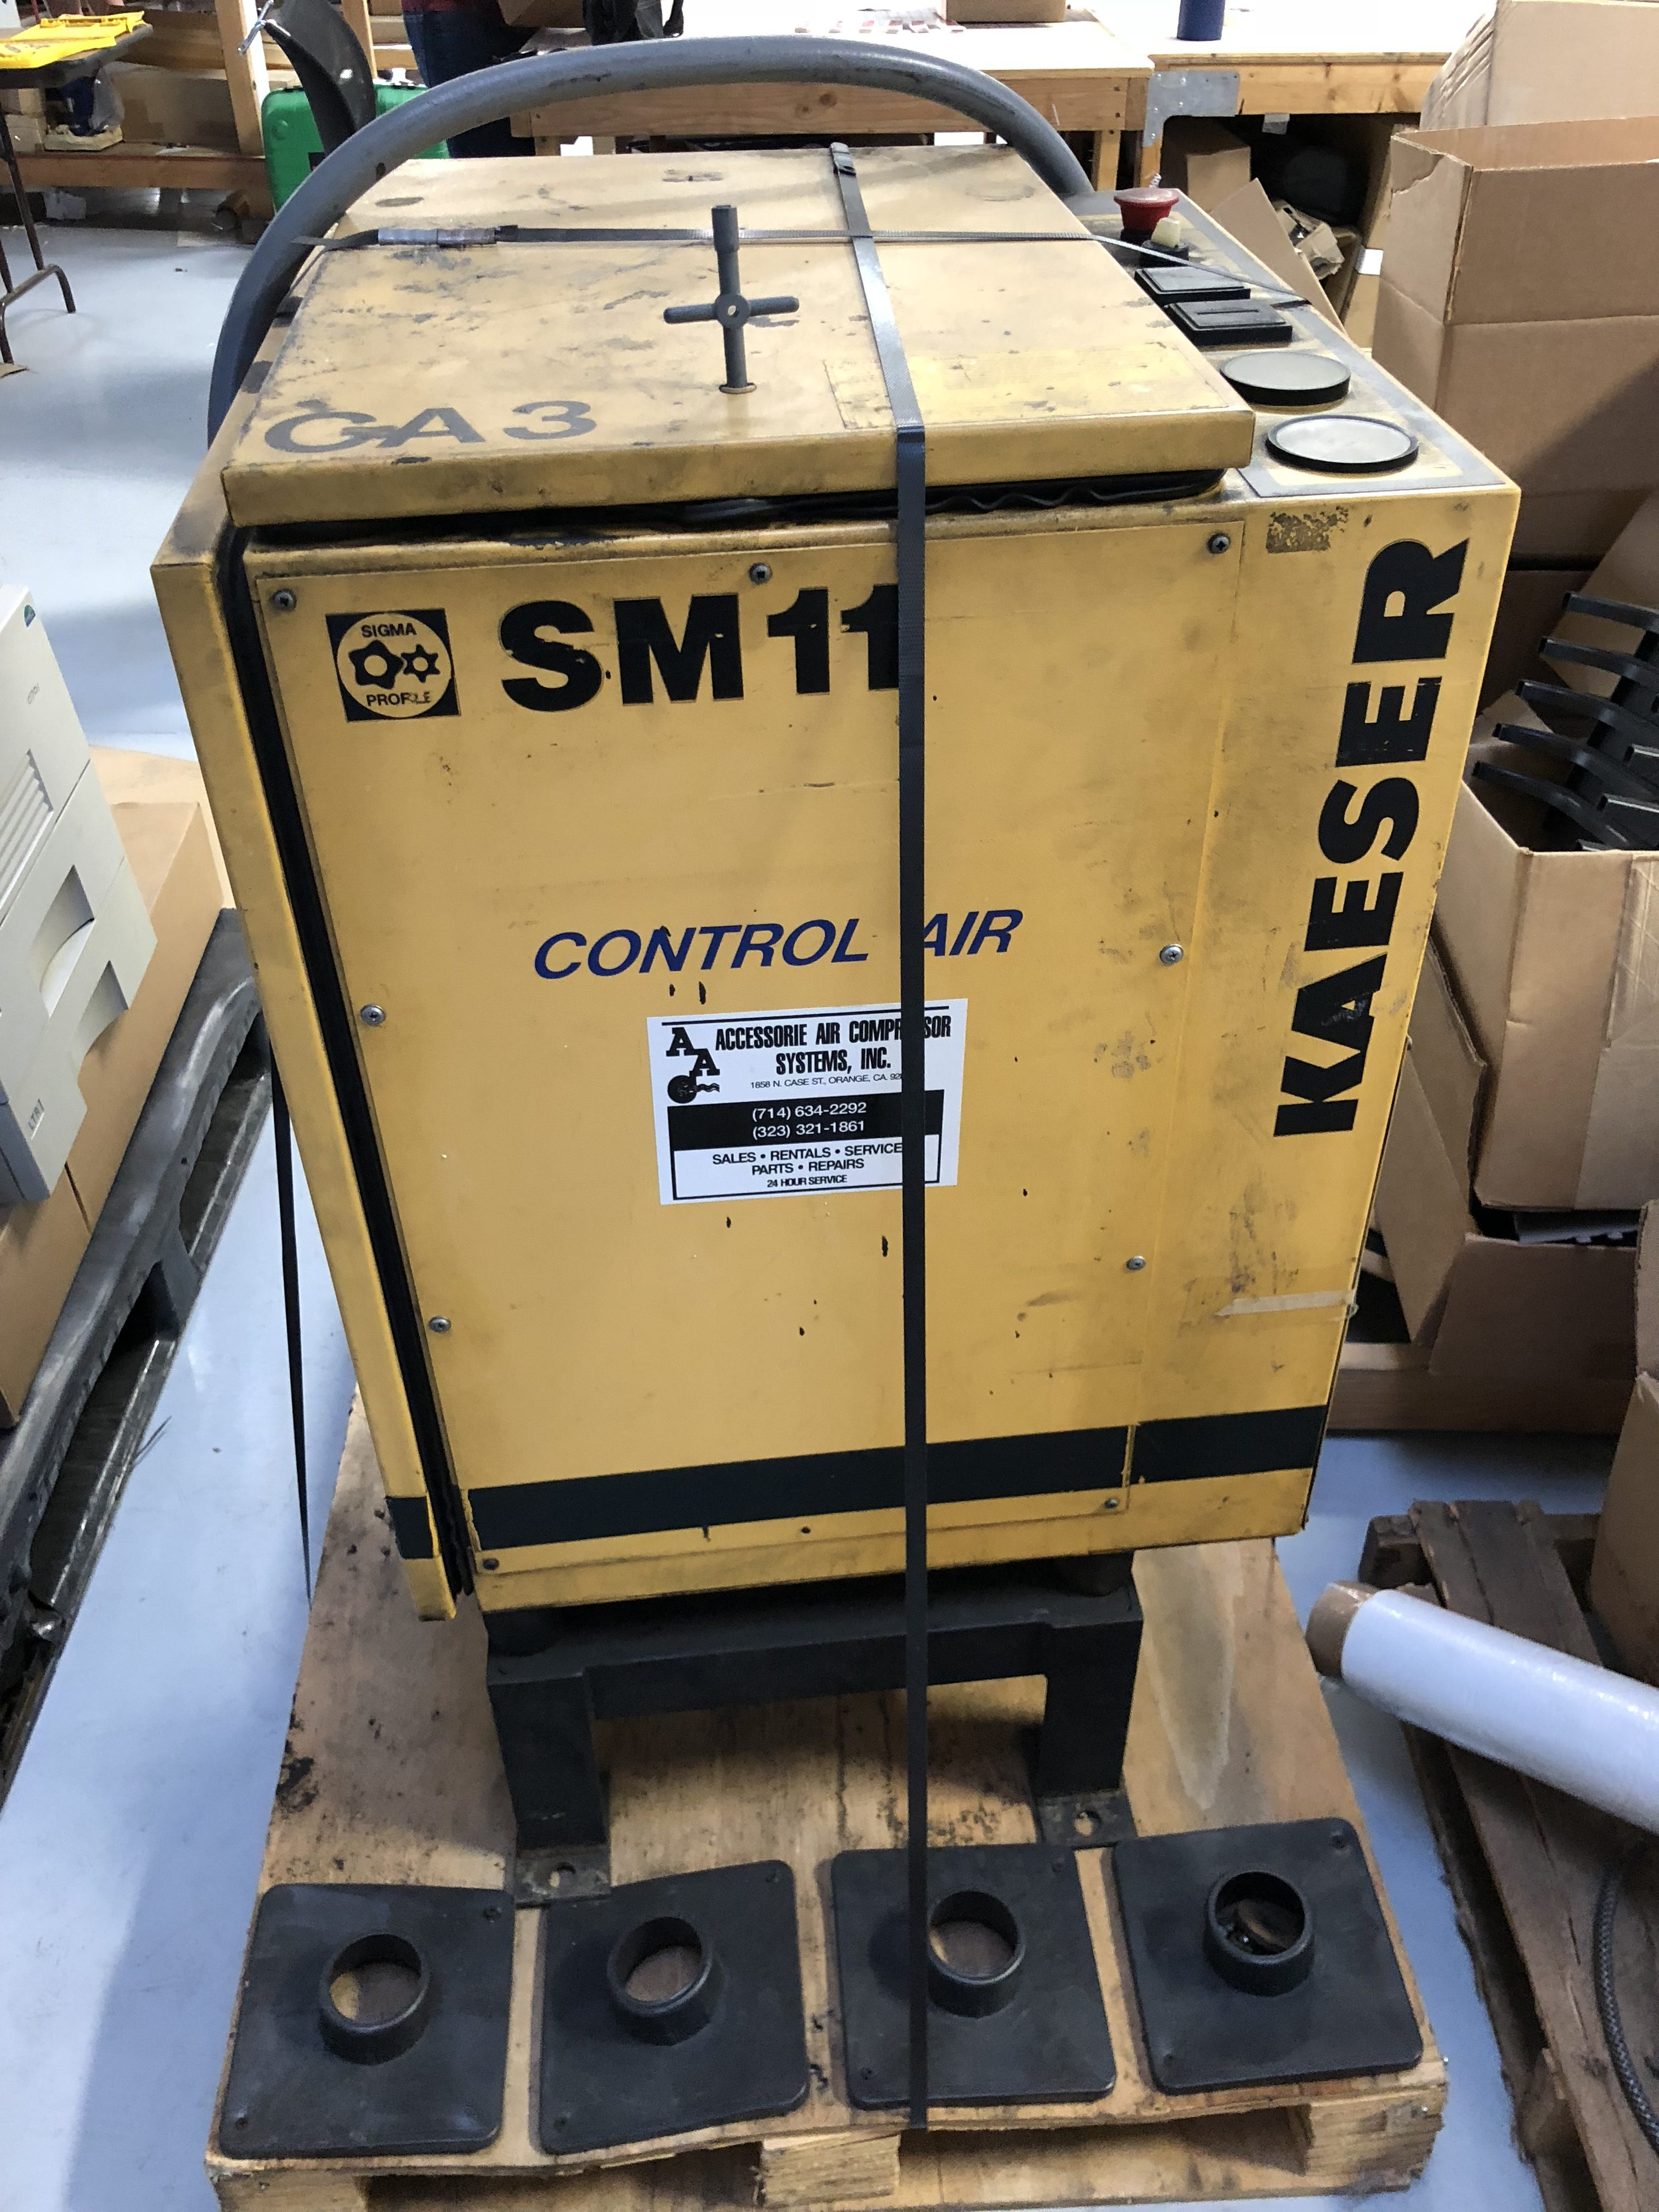 Kaeser Sm11 Air Compressor Digital Equipment Brokers